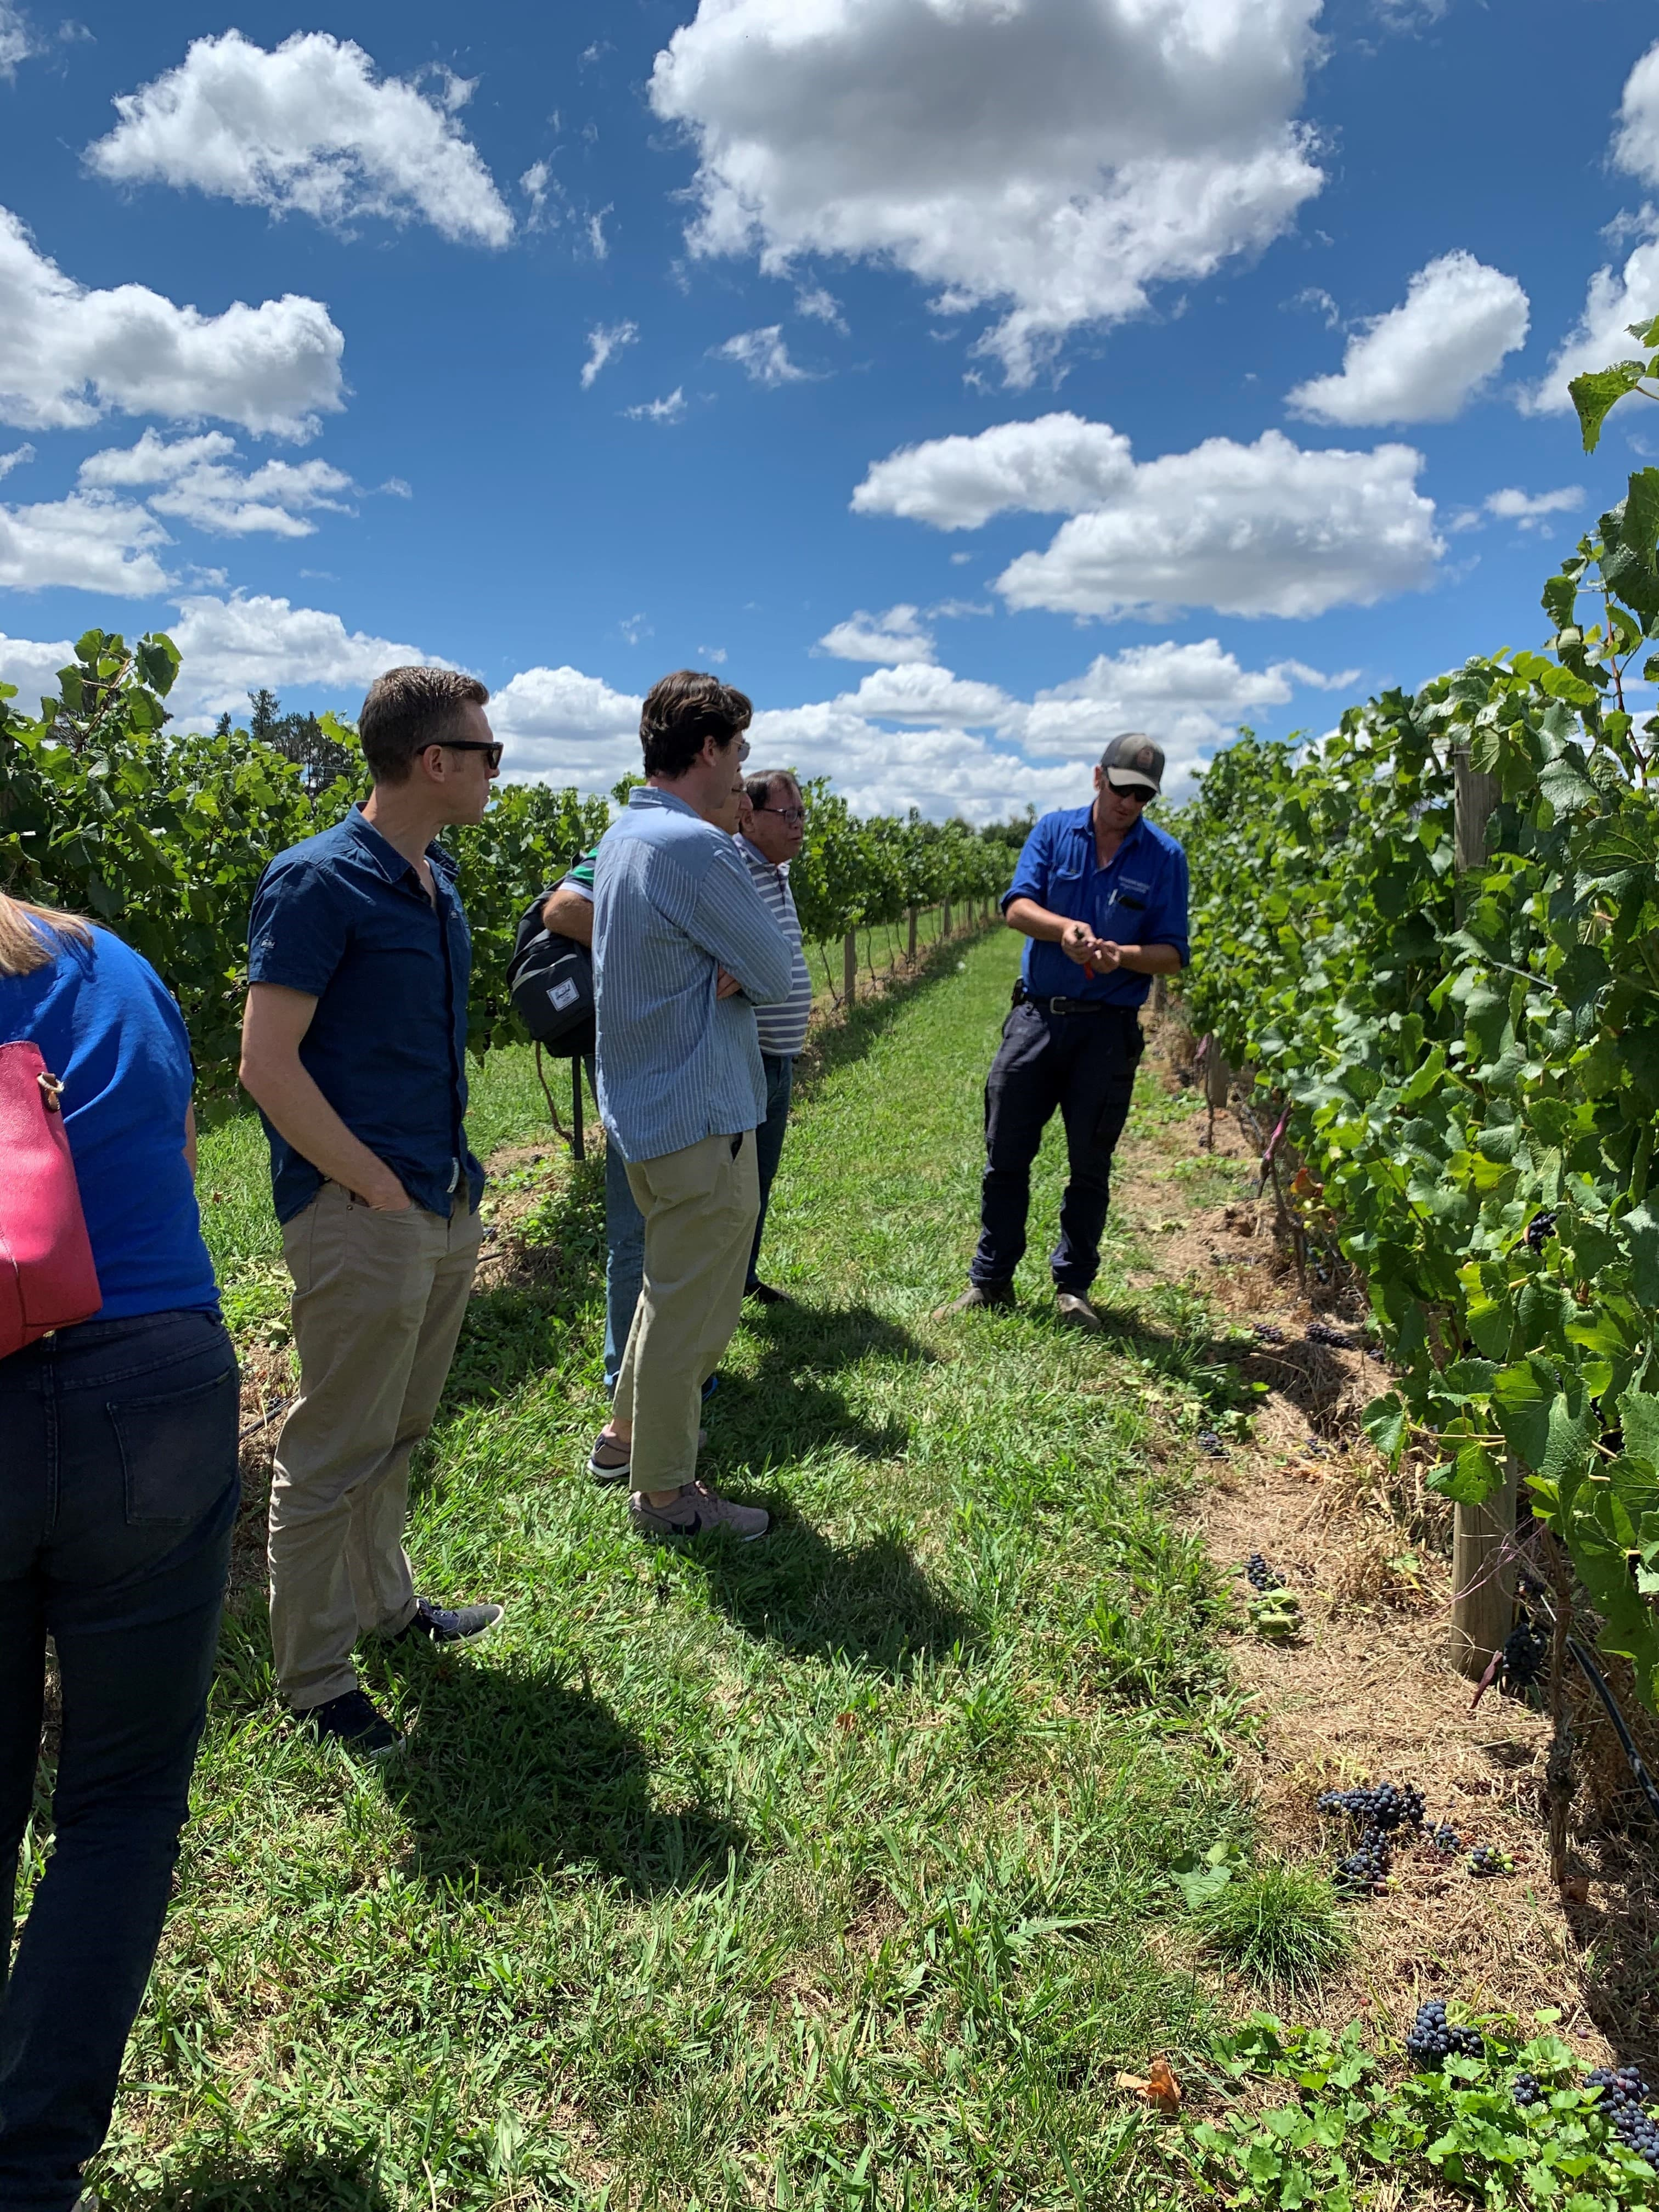 4 men listening to winemaker share story of wine making in vineyard